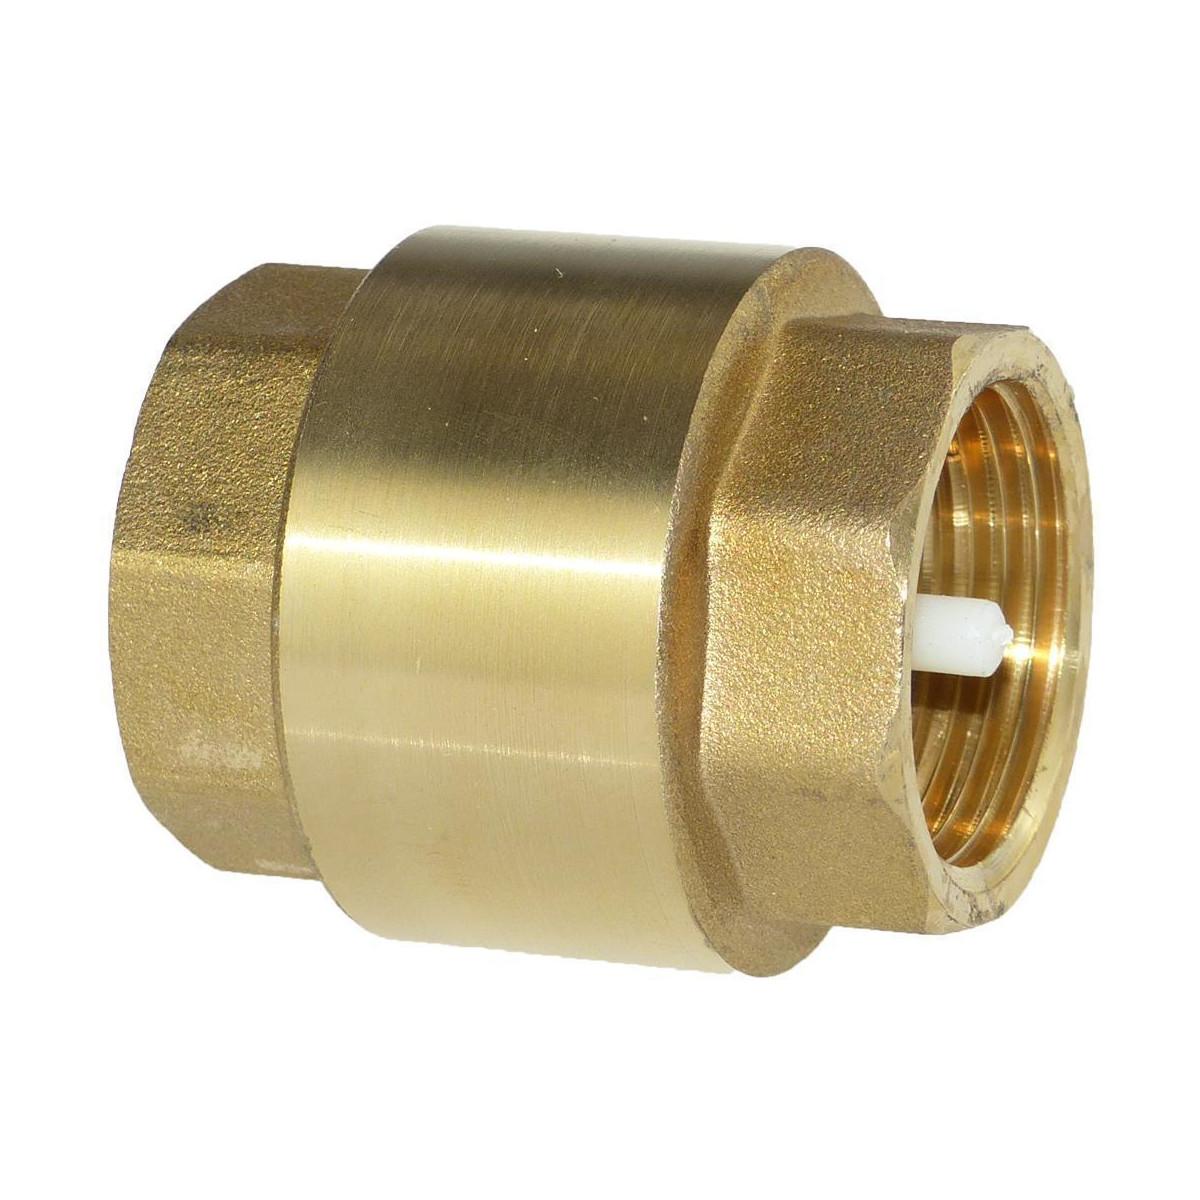 Rückschlagventil 3 4 Zoll : messing r ckschlagventil 3 4 zoll plastik shutter 3 78 ~ Watch28wear.com Haus und Dekorationen